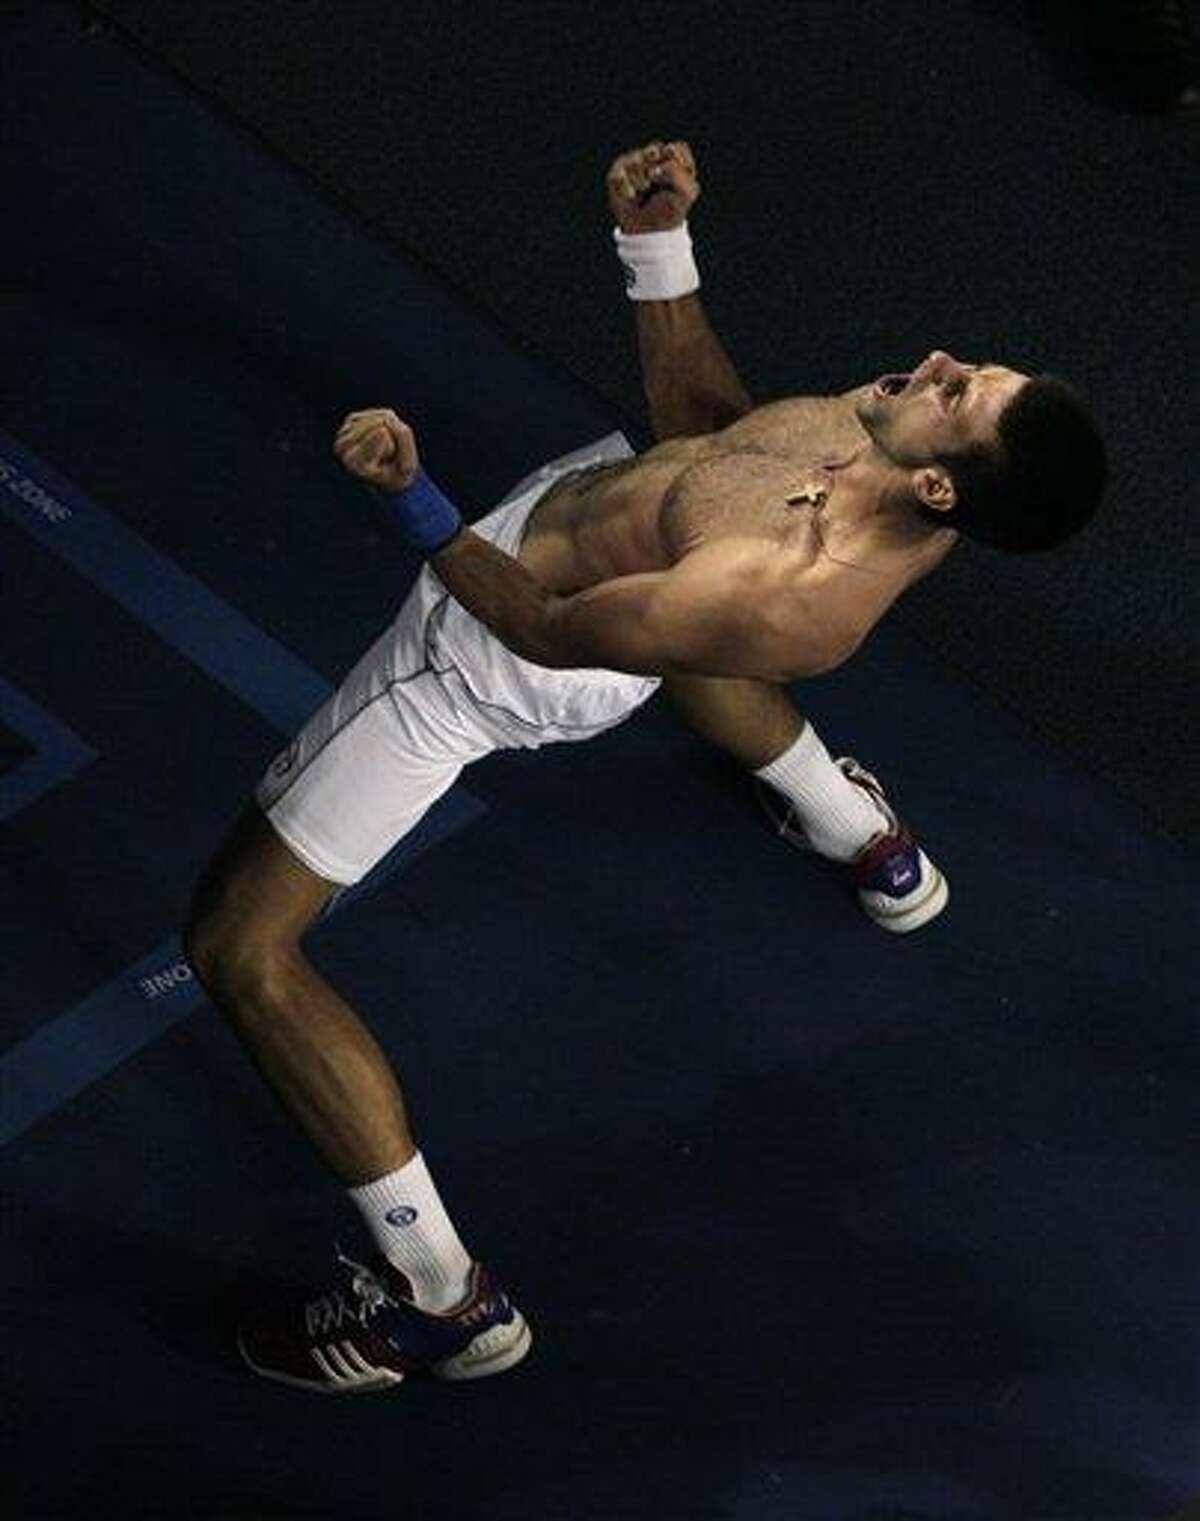 Novak Djokovic of Serbia celebrates after defeating Rafael Nadal of Spain during the men's singles final at the Australian Open tennis championship, in Melbourne, Australia, Monday, Jan. 30, 2012. Associated Press